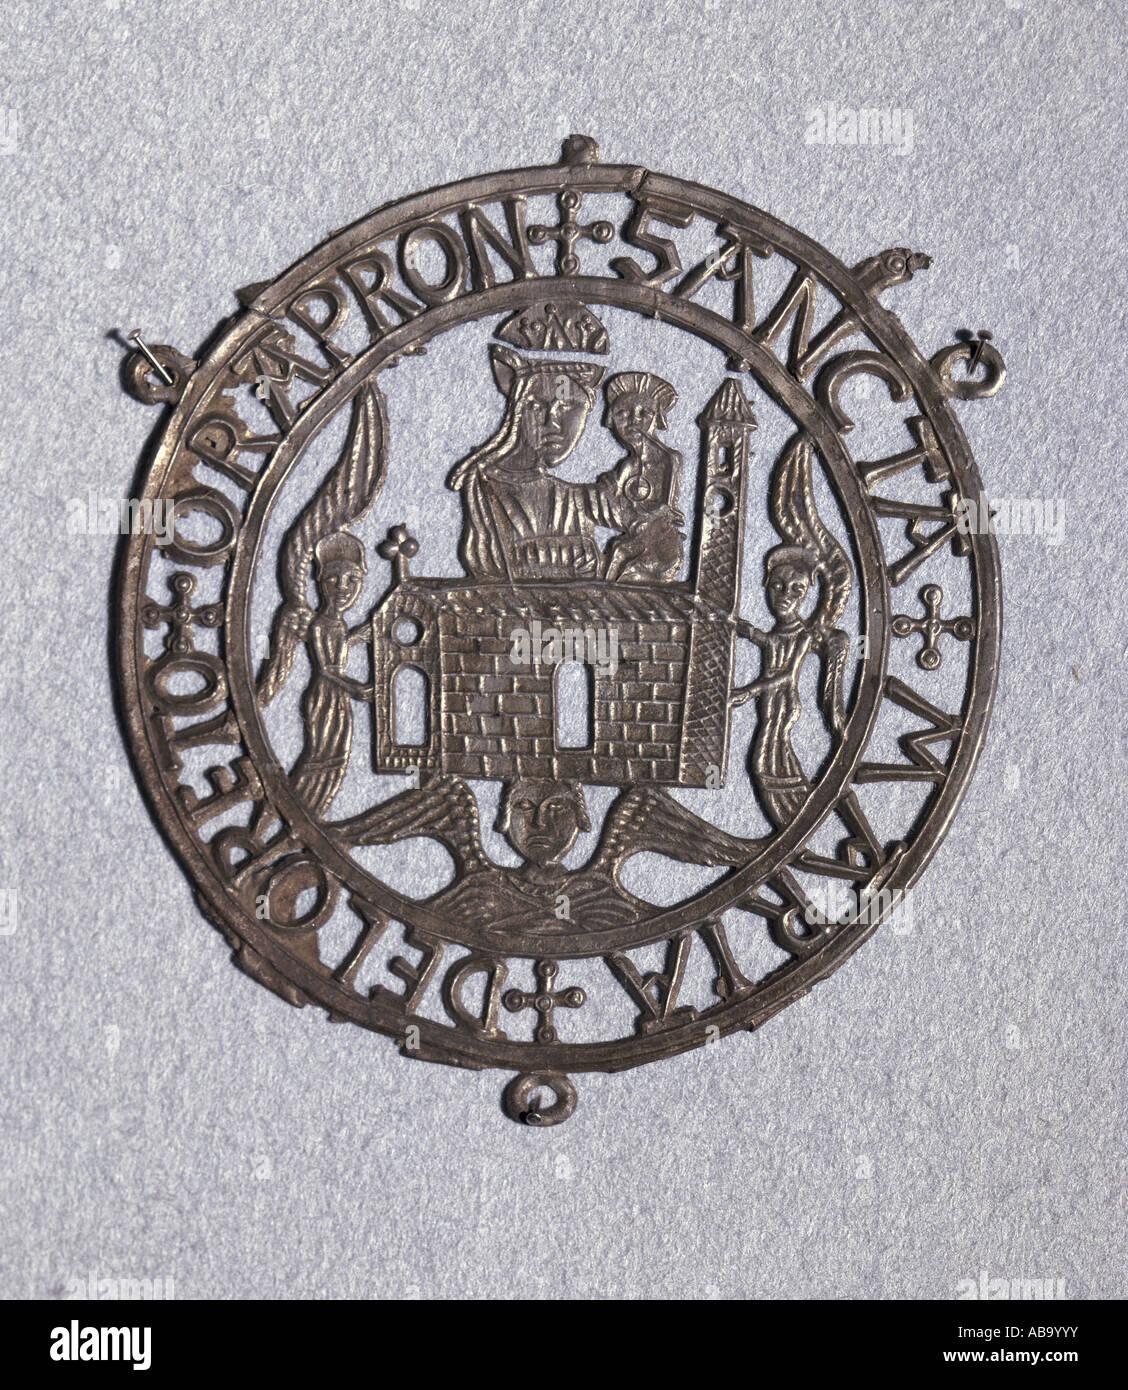 religion, christianity, pilgramage, pilgrimS s badge, Holy House of Nazareth, tin alloy, Loreto, 14th century, private - Stock Image